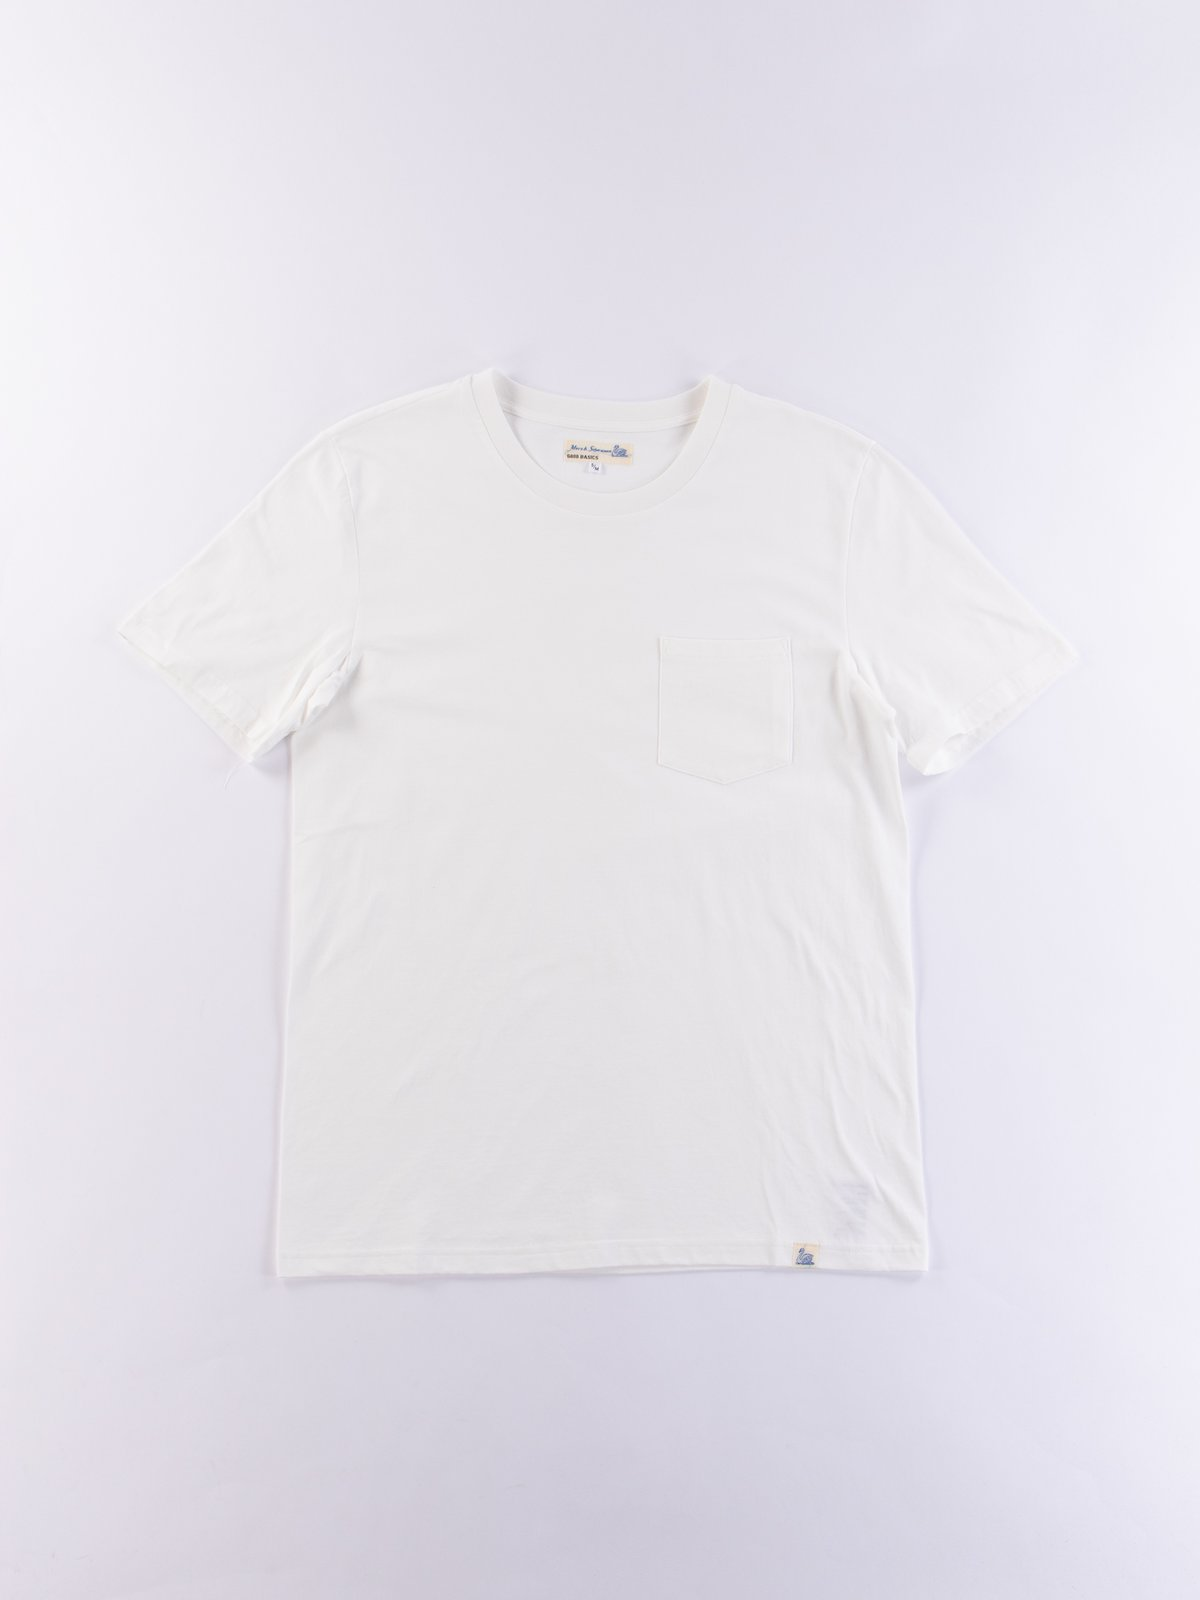 White Good Basics CTP01 Pocket Crew Neck Tee - Image 1